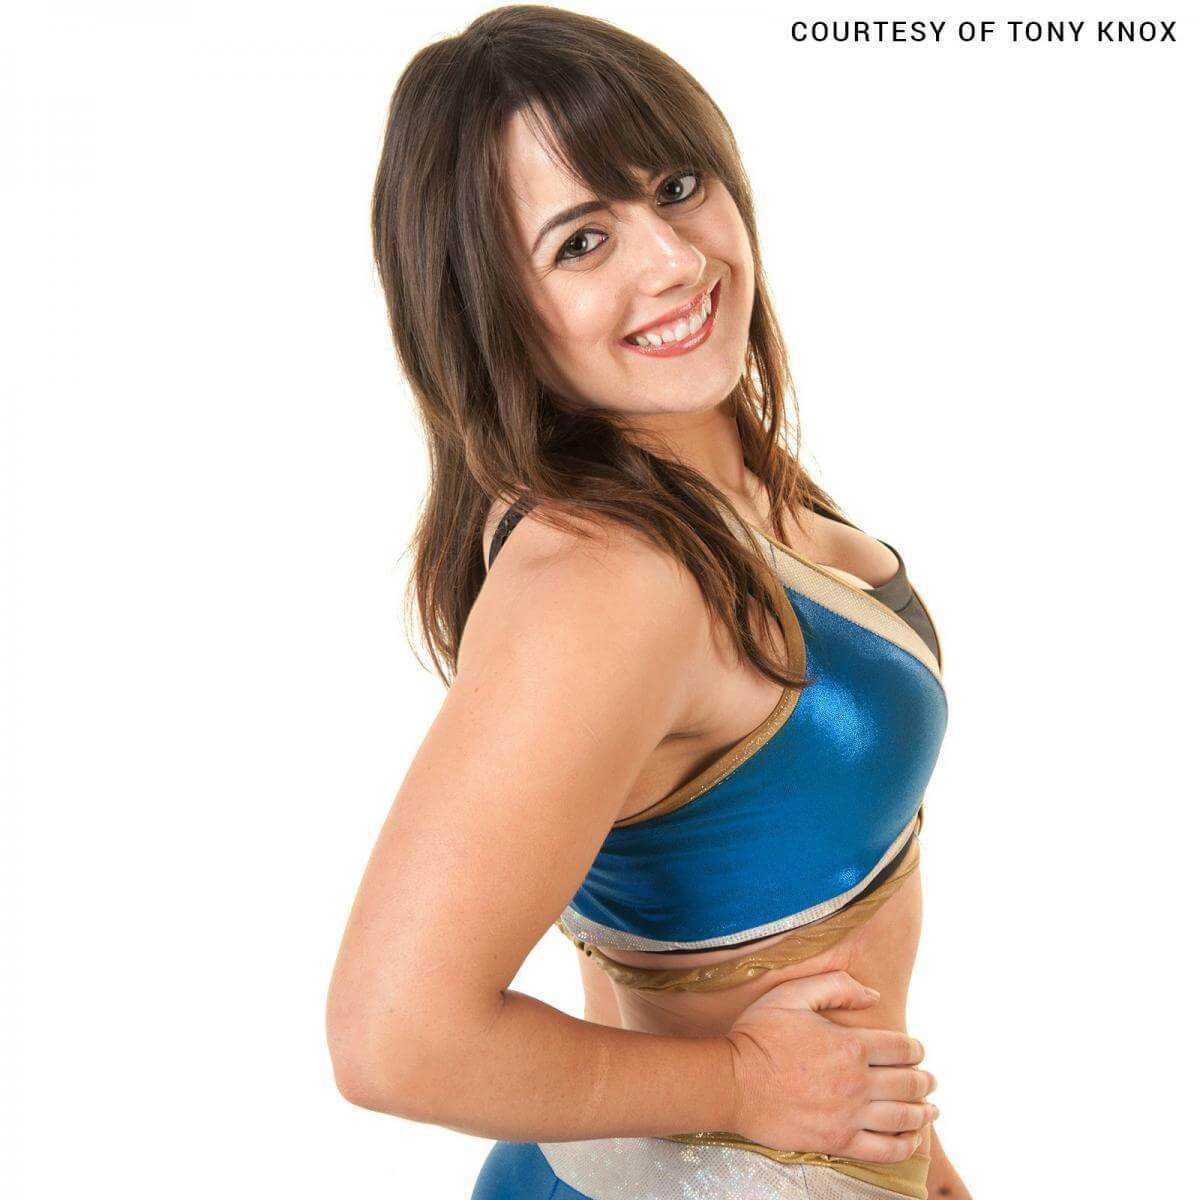 Nikki-Cross-sexy-smile